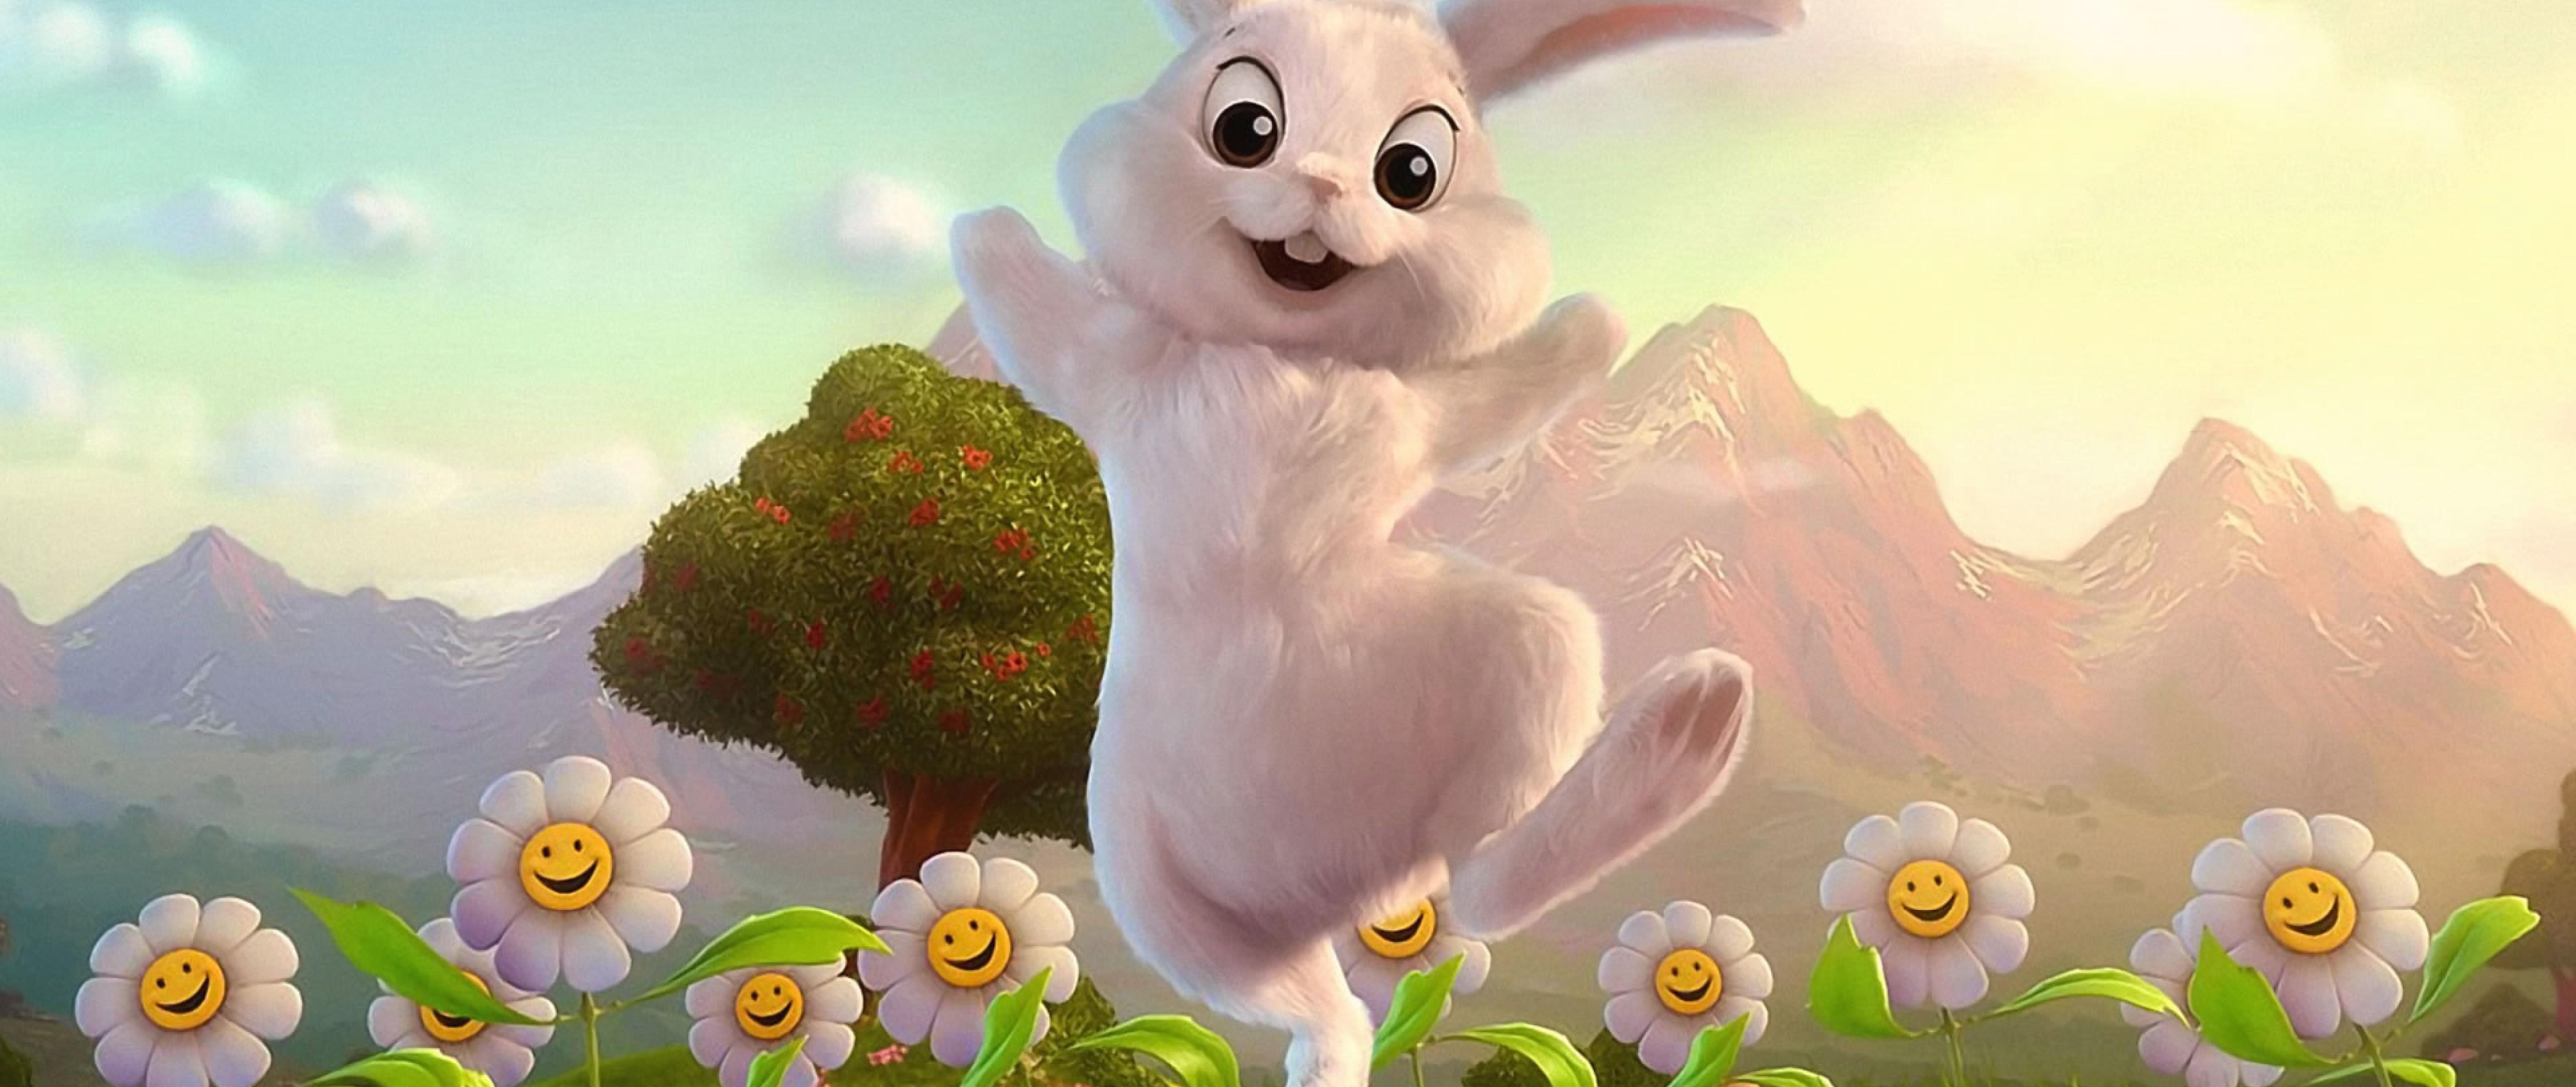 Cute Bugs Bunny White Rabbit Cartoon Wallpaper For Desktop And